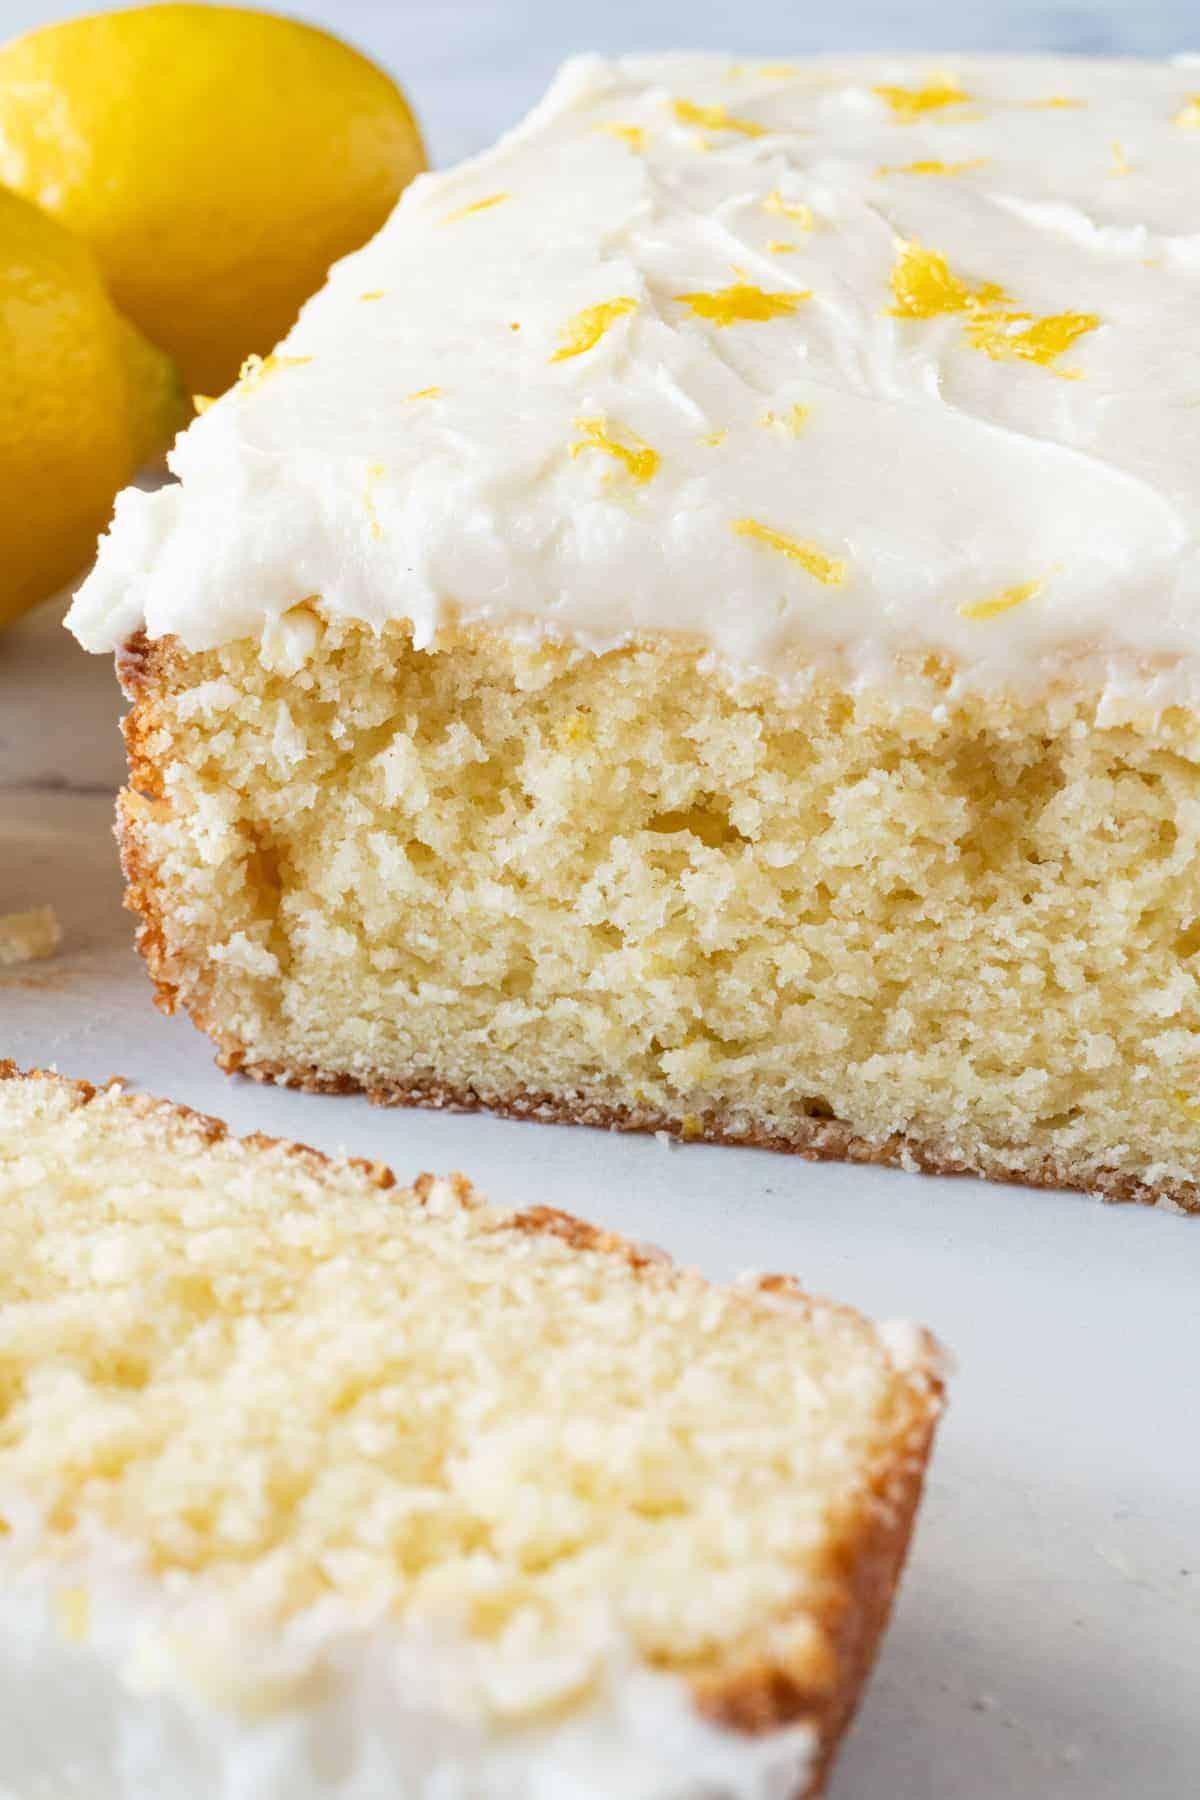 Lemon cake with slice cut